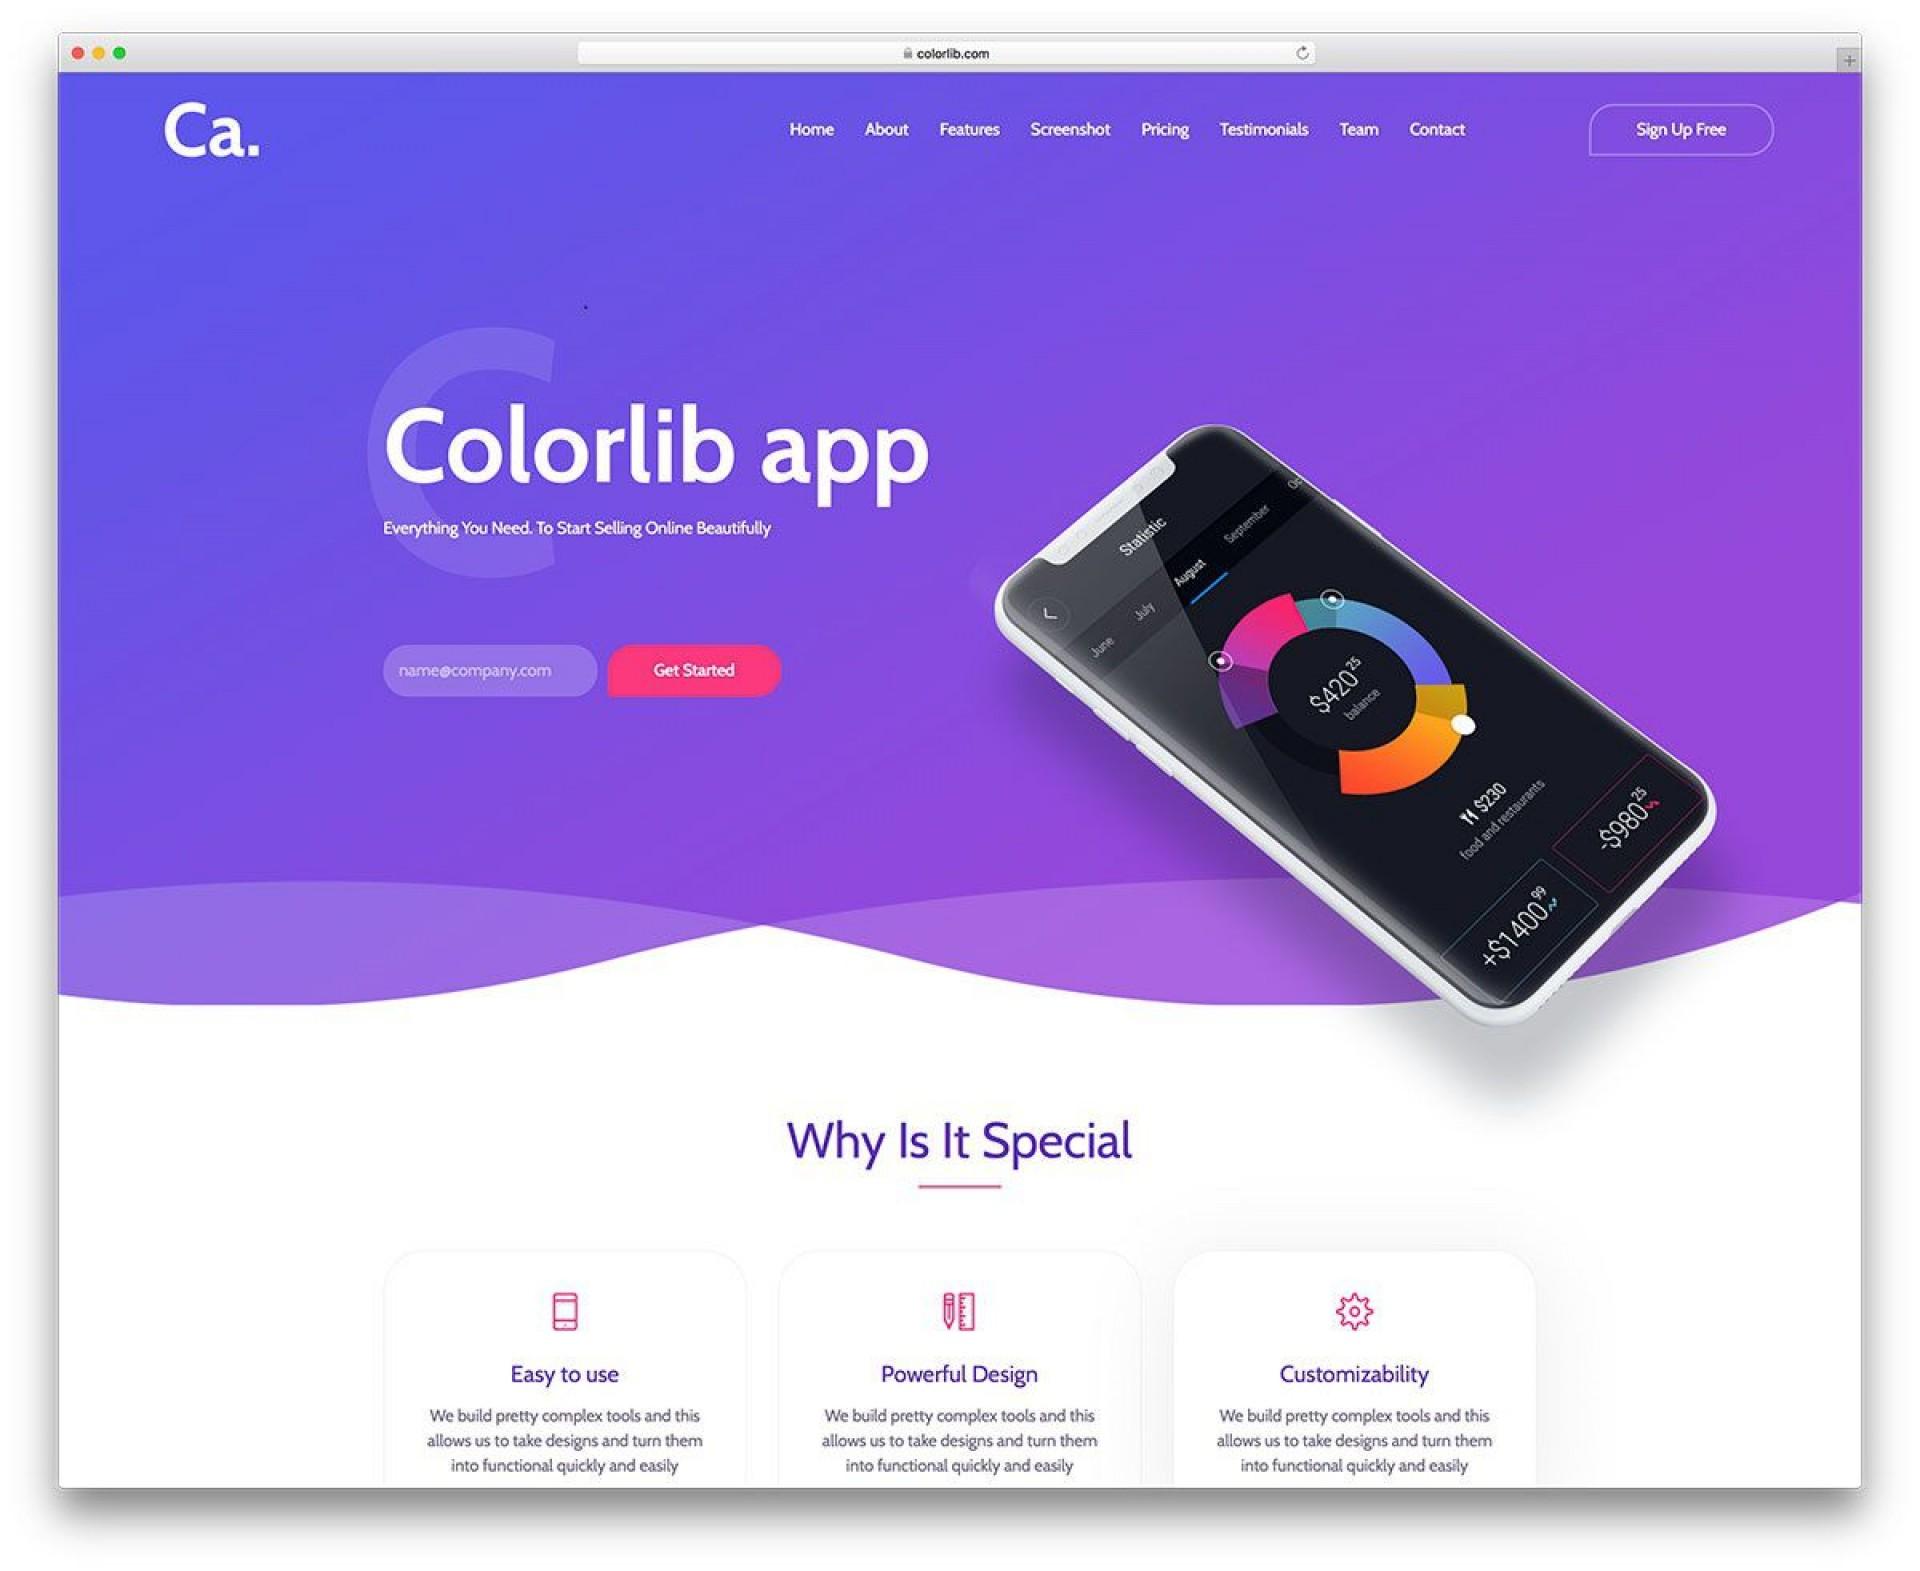 002 Wondrou Free Landing Page Template Bootstrap Concept  3 Html5 20191920